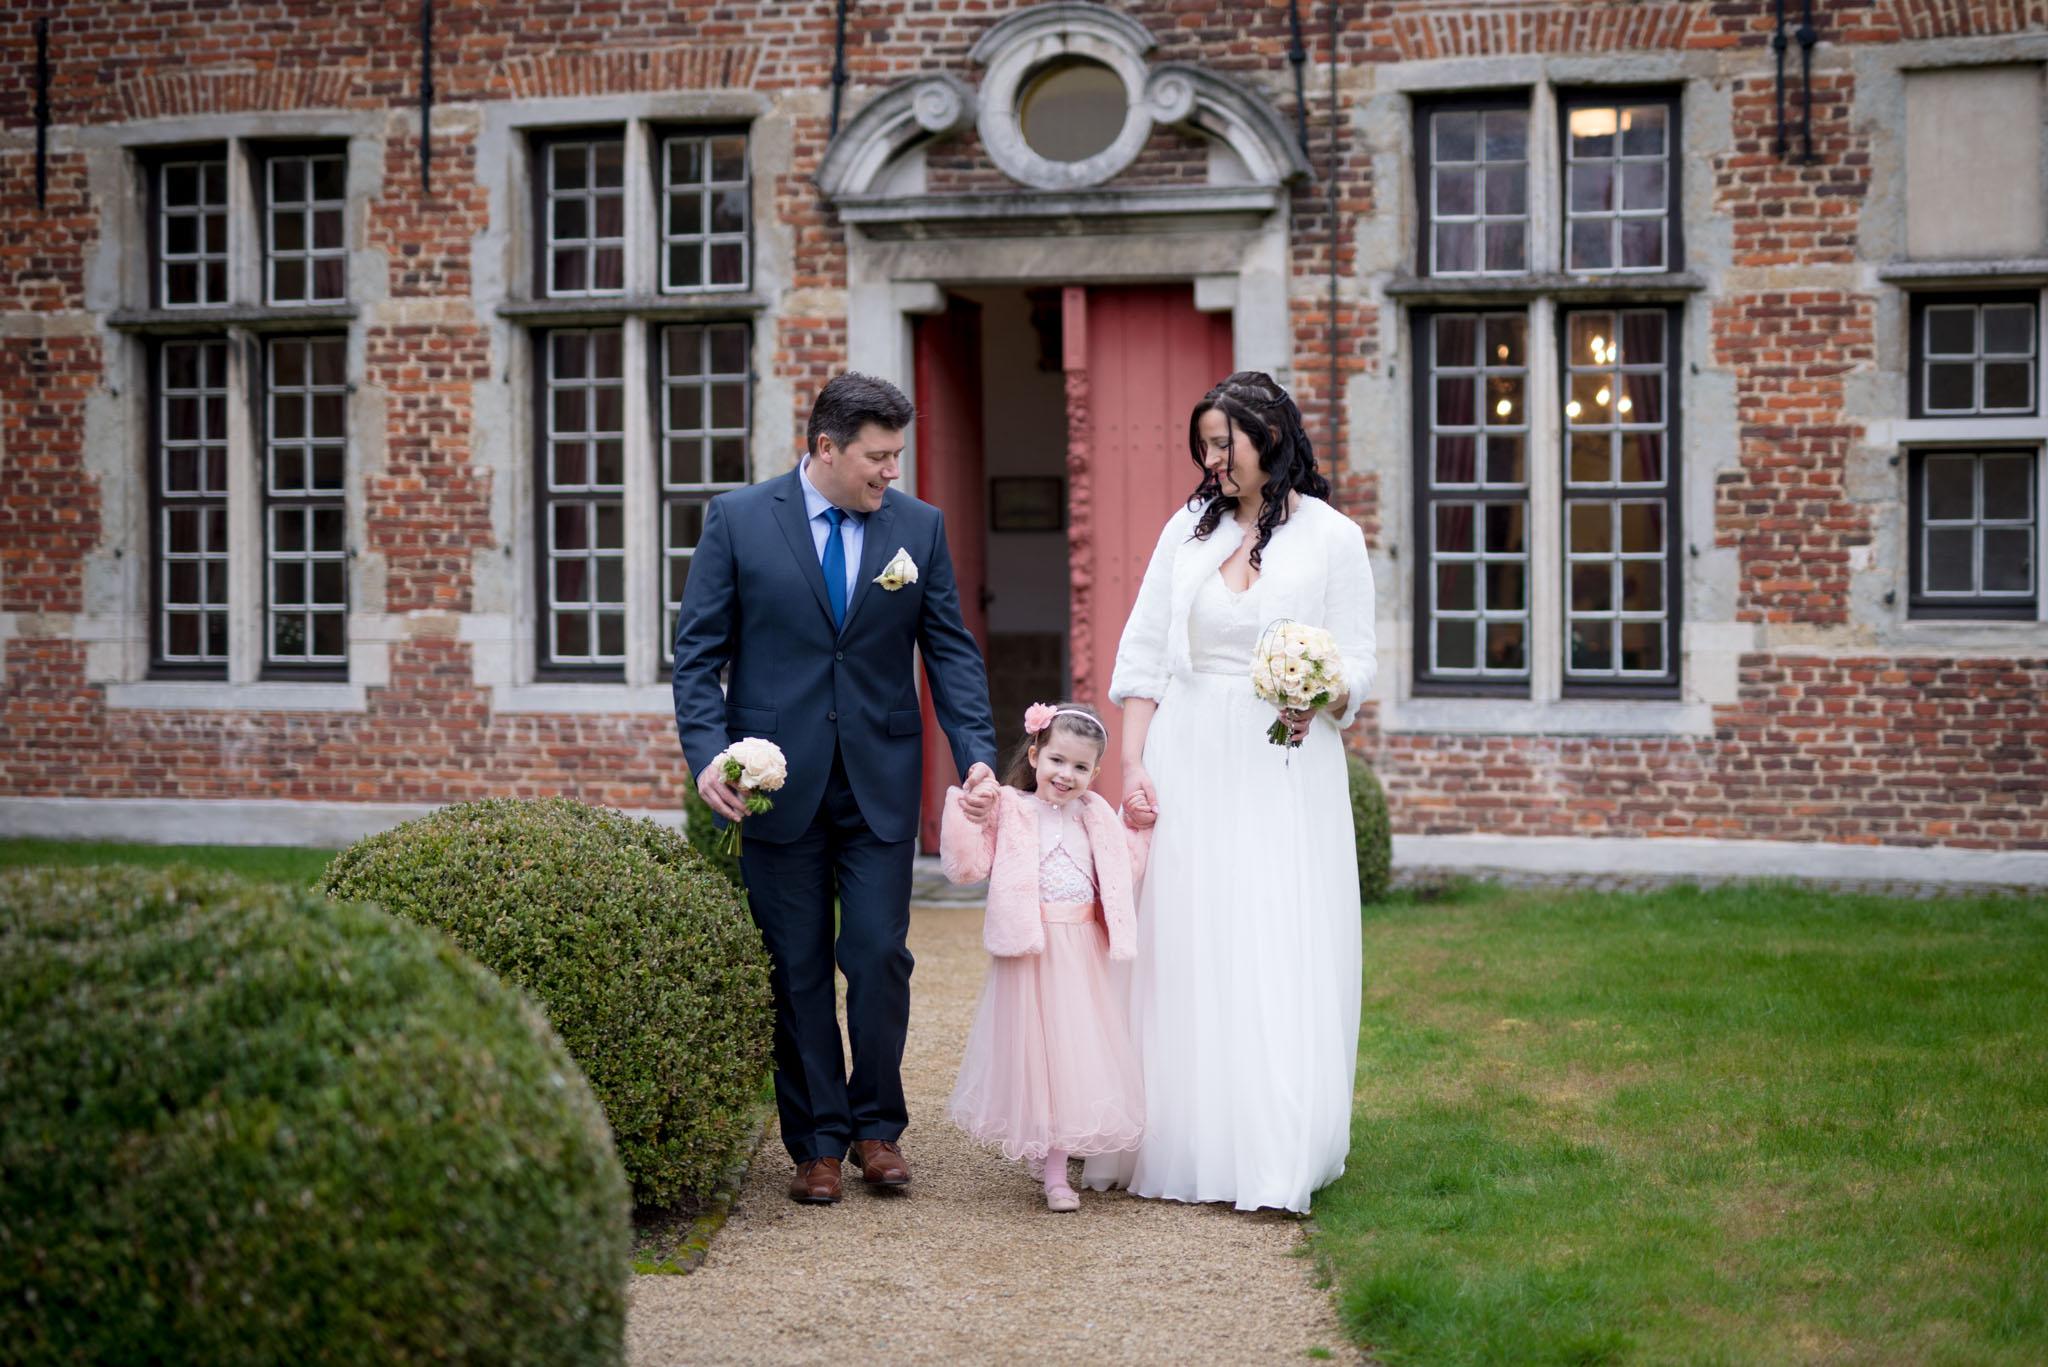 Trouwfoto bruid, bruidegom & dochter